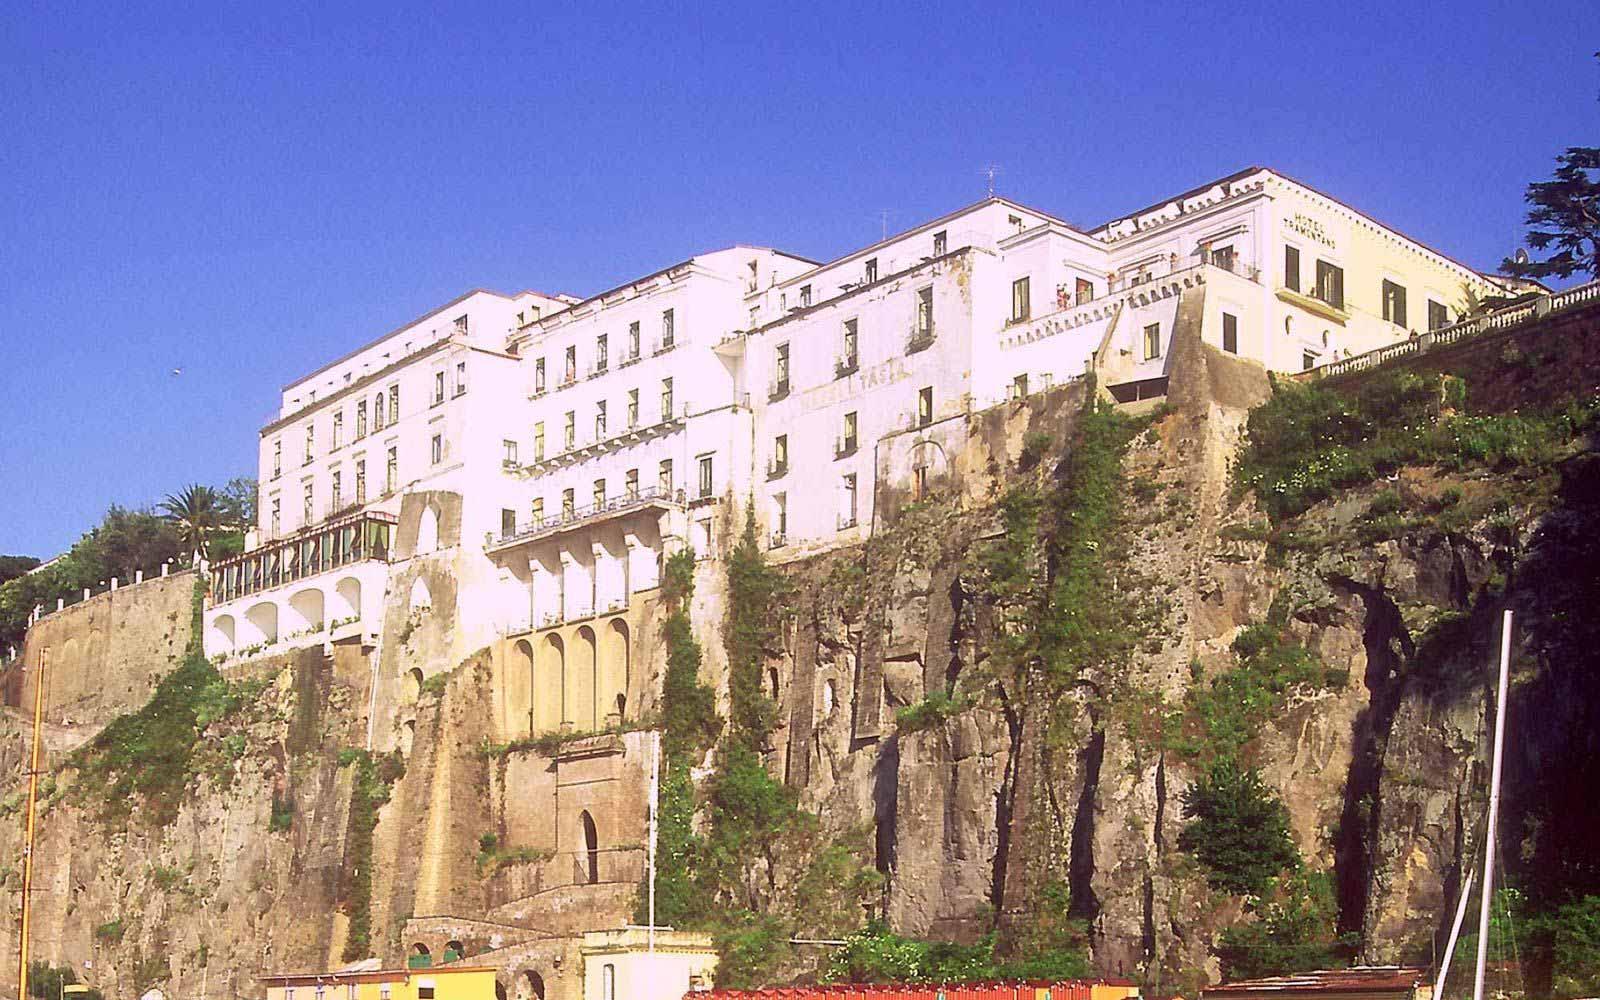 Imperial Hotel Tramontano Sorrento Neapolitan Riviera Italy Sardatur